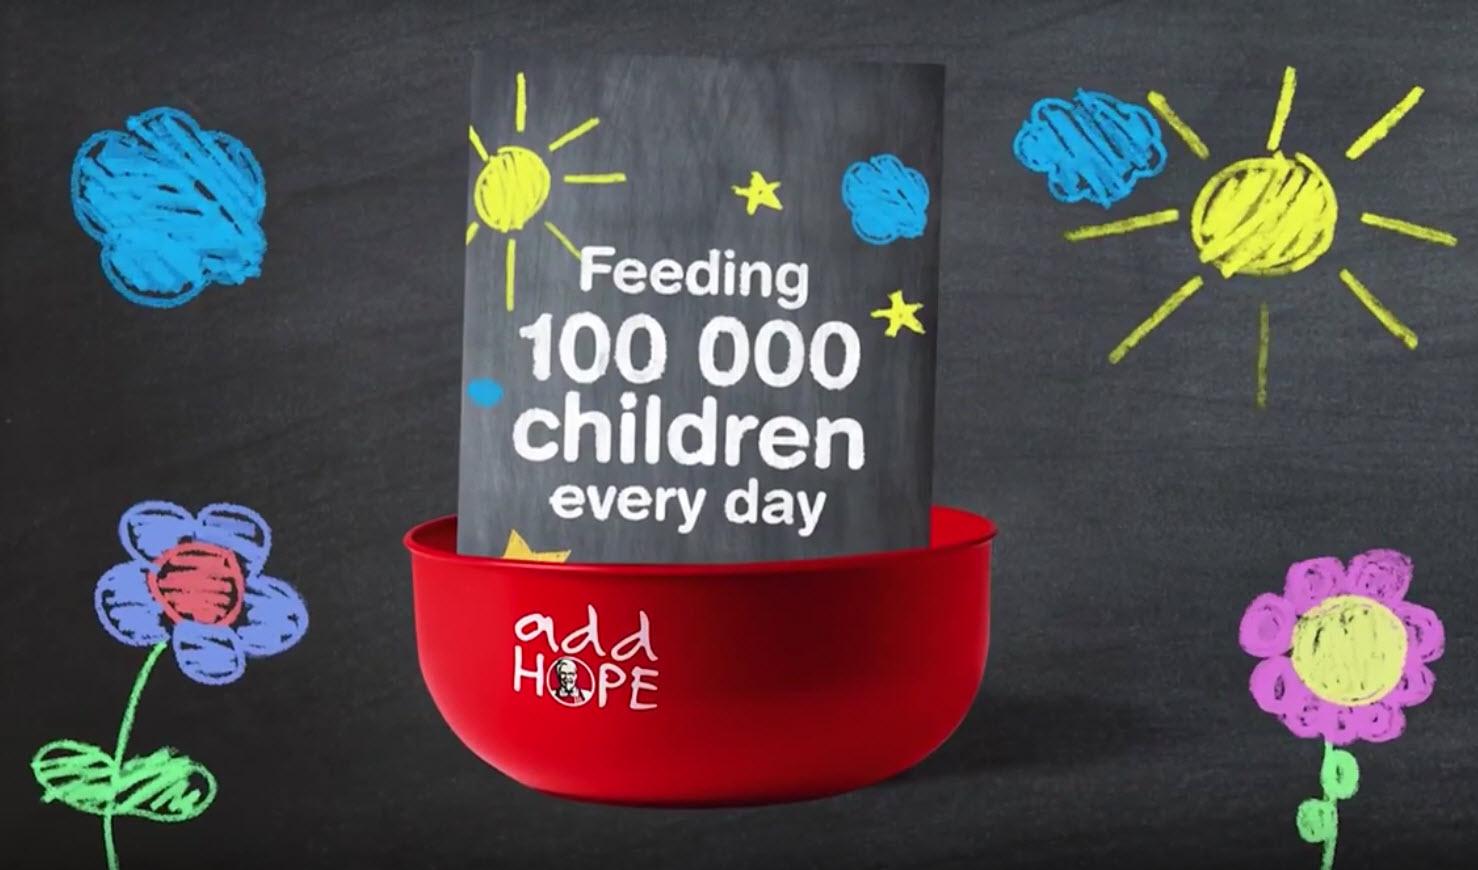 KFC 'Add Hope' Campaign World Hunger Day (2015)